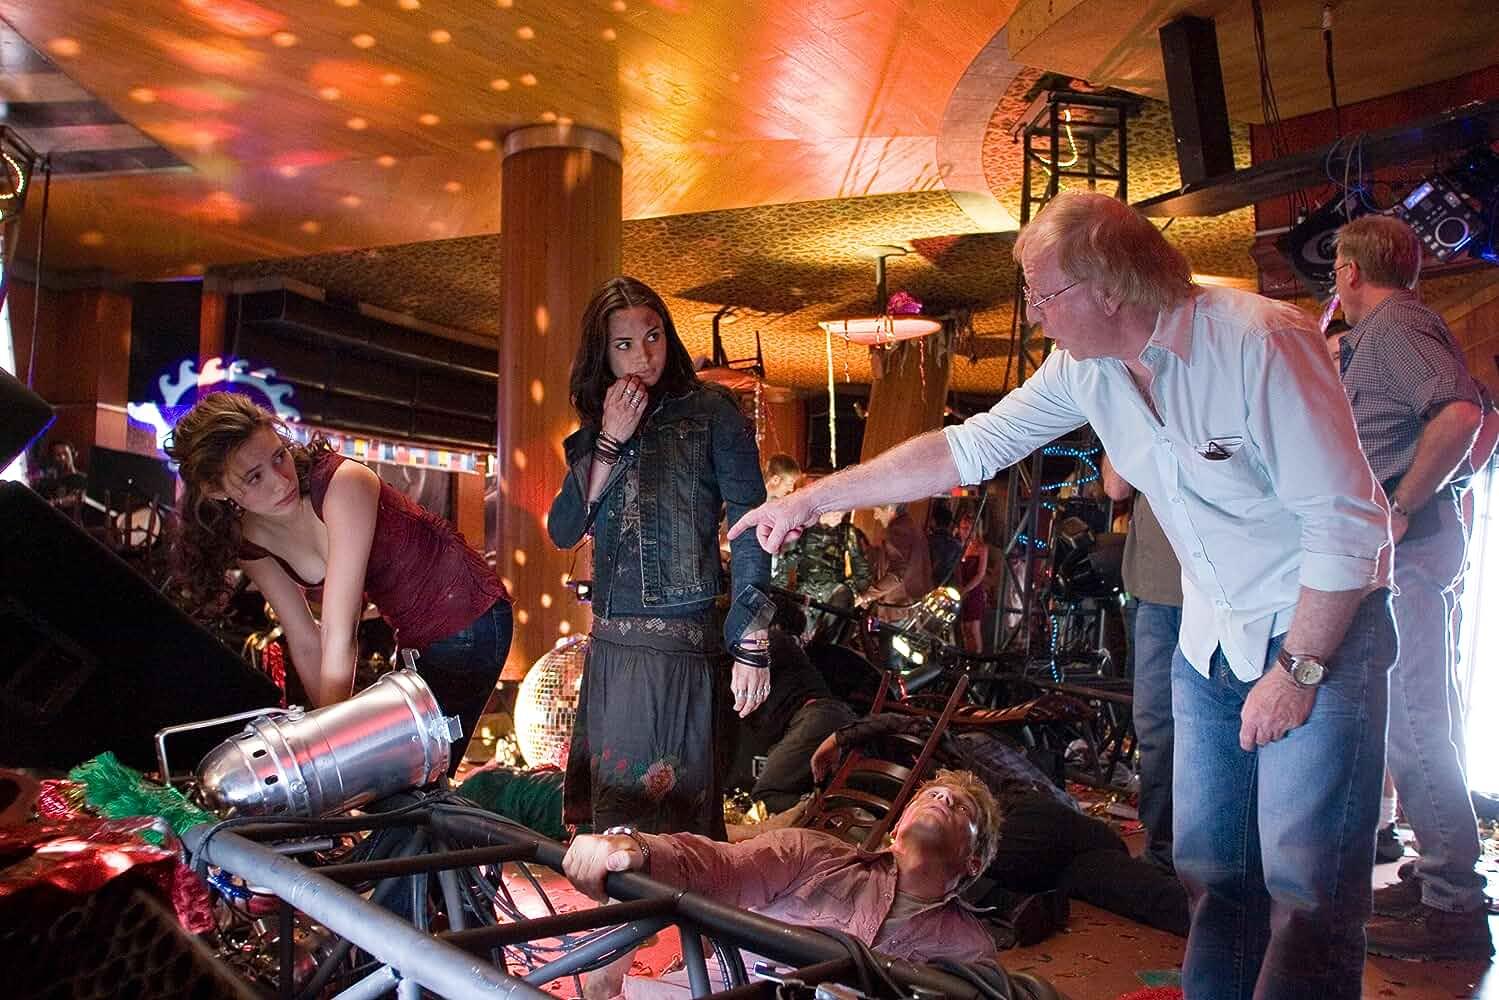 Wolfgang Petersen, Emmy Rossum, Mía Maestro, and Mike Vogel in Poseidon (2006)